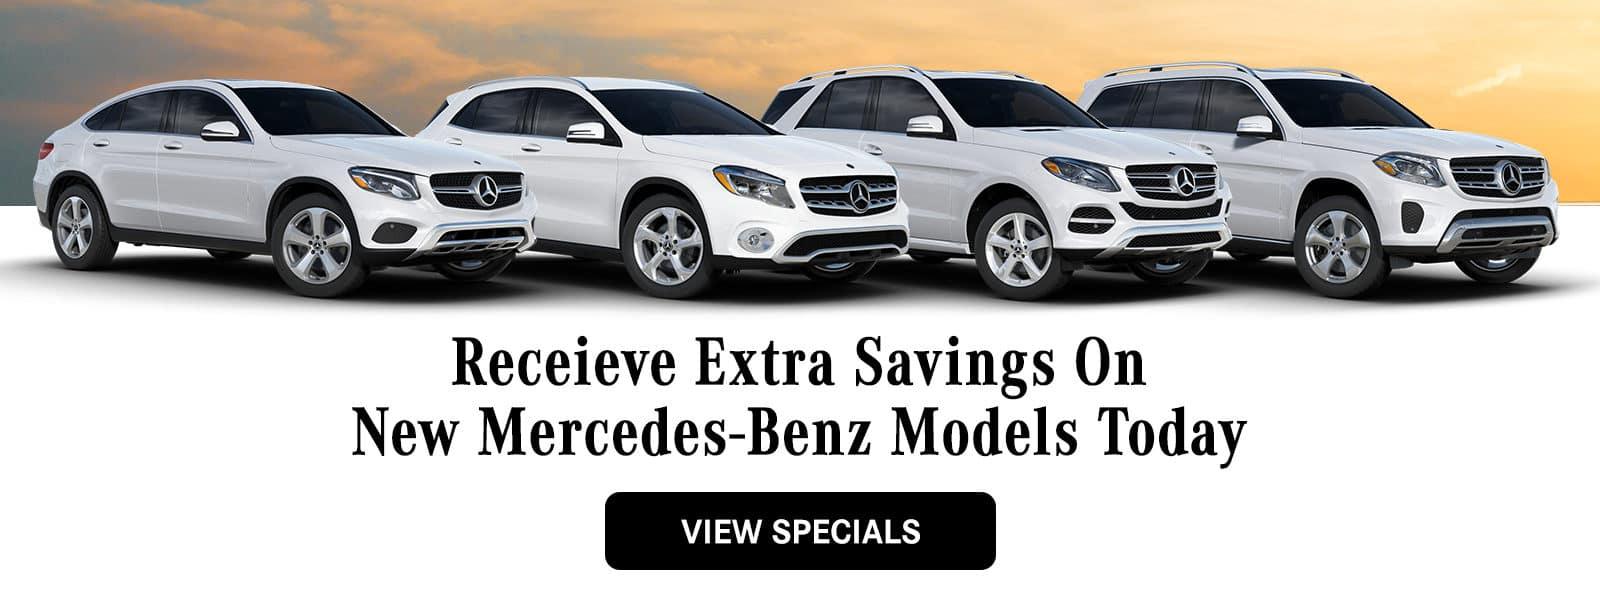 Mercedes benz of omaha ne new mercedes benz sales service for Mercedes benz of cincinnati new dealership